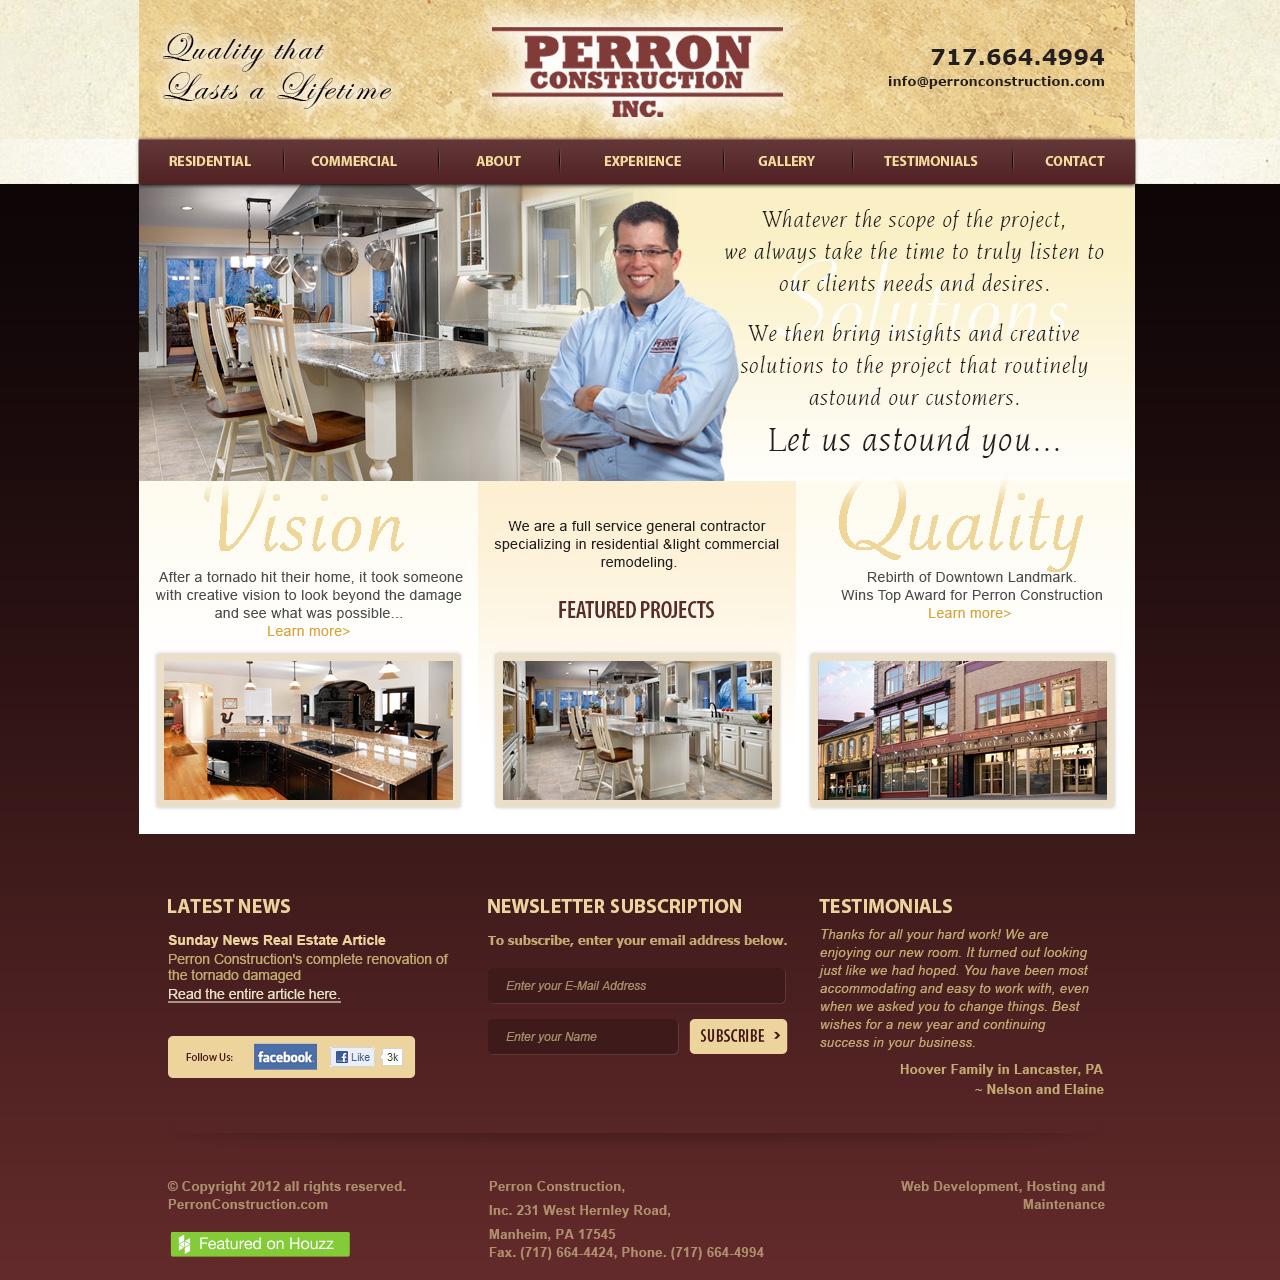 Perron Construction Inc - General construction company website design